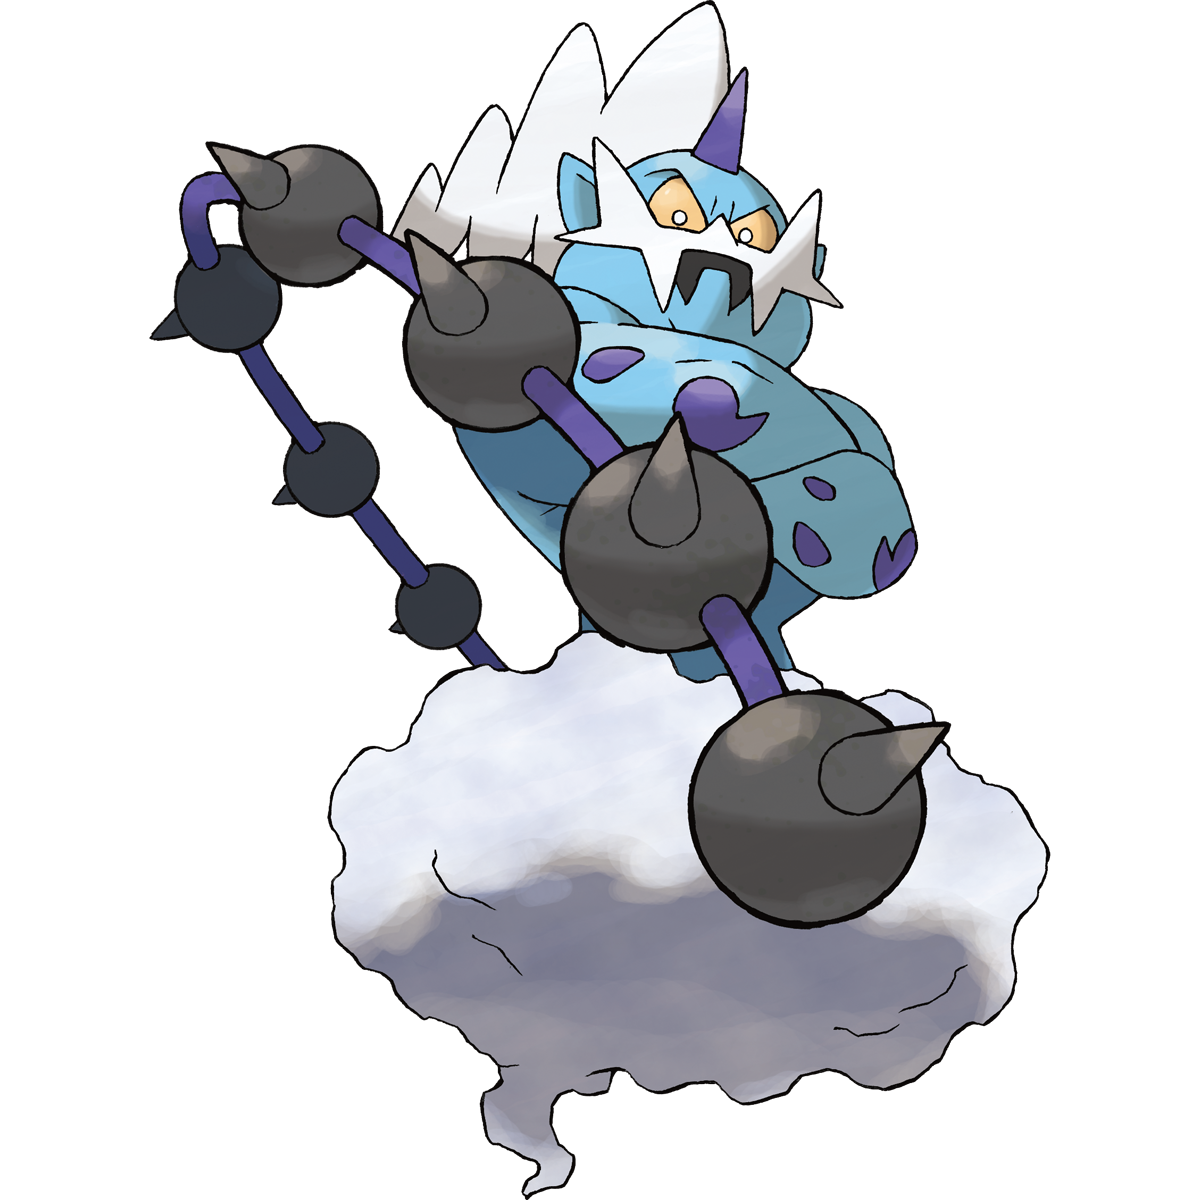 Voltolos I Pokémon Analysen Bisaboard